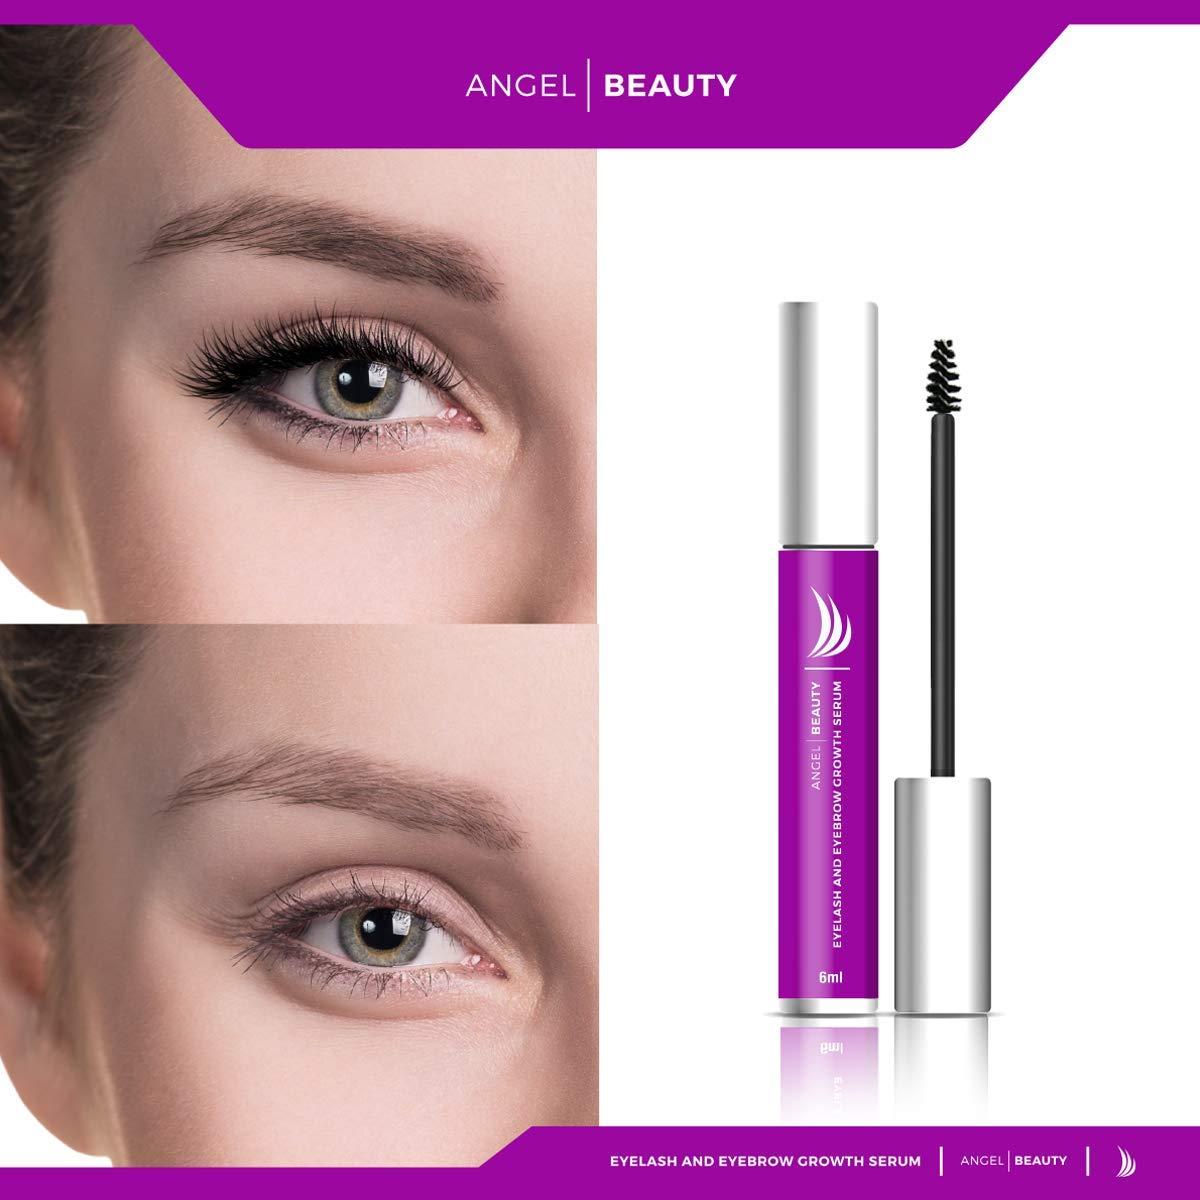 1bc5ebf1379 Amazon.com: Eyelash Growth Serum, Eyelash Growth, Eyelash Growth Treatment  - Eyelash and Eyebrow Growth Serum By Angel Beauty - Unisex, Keratinocytes,  ...